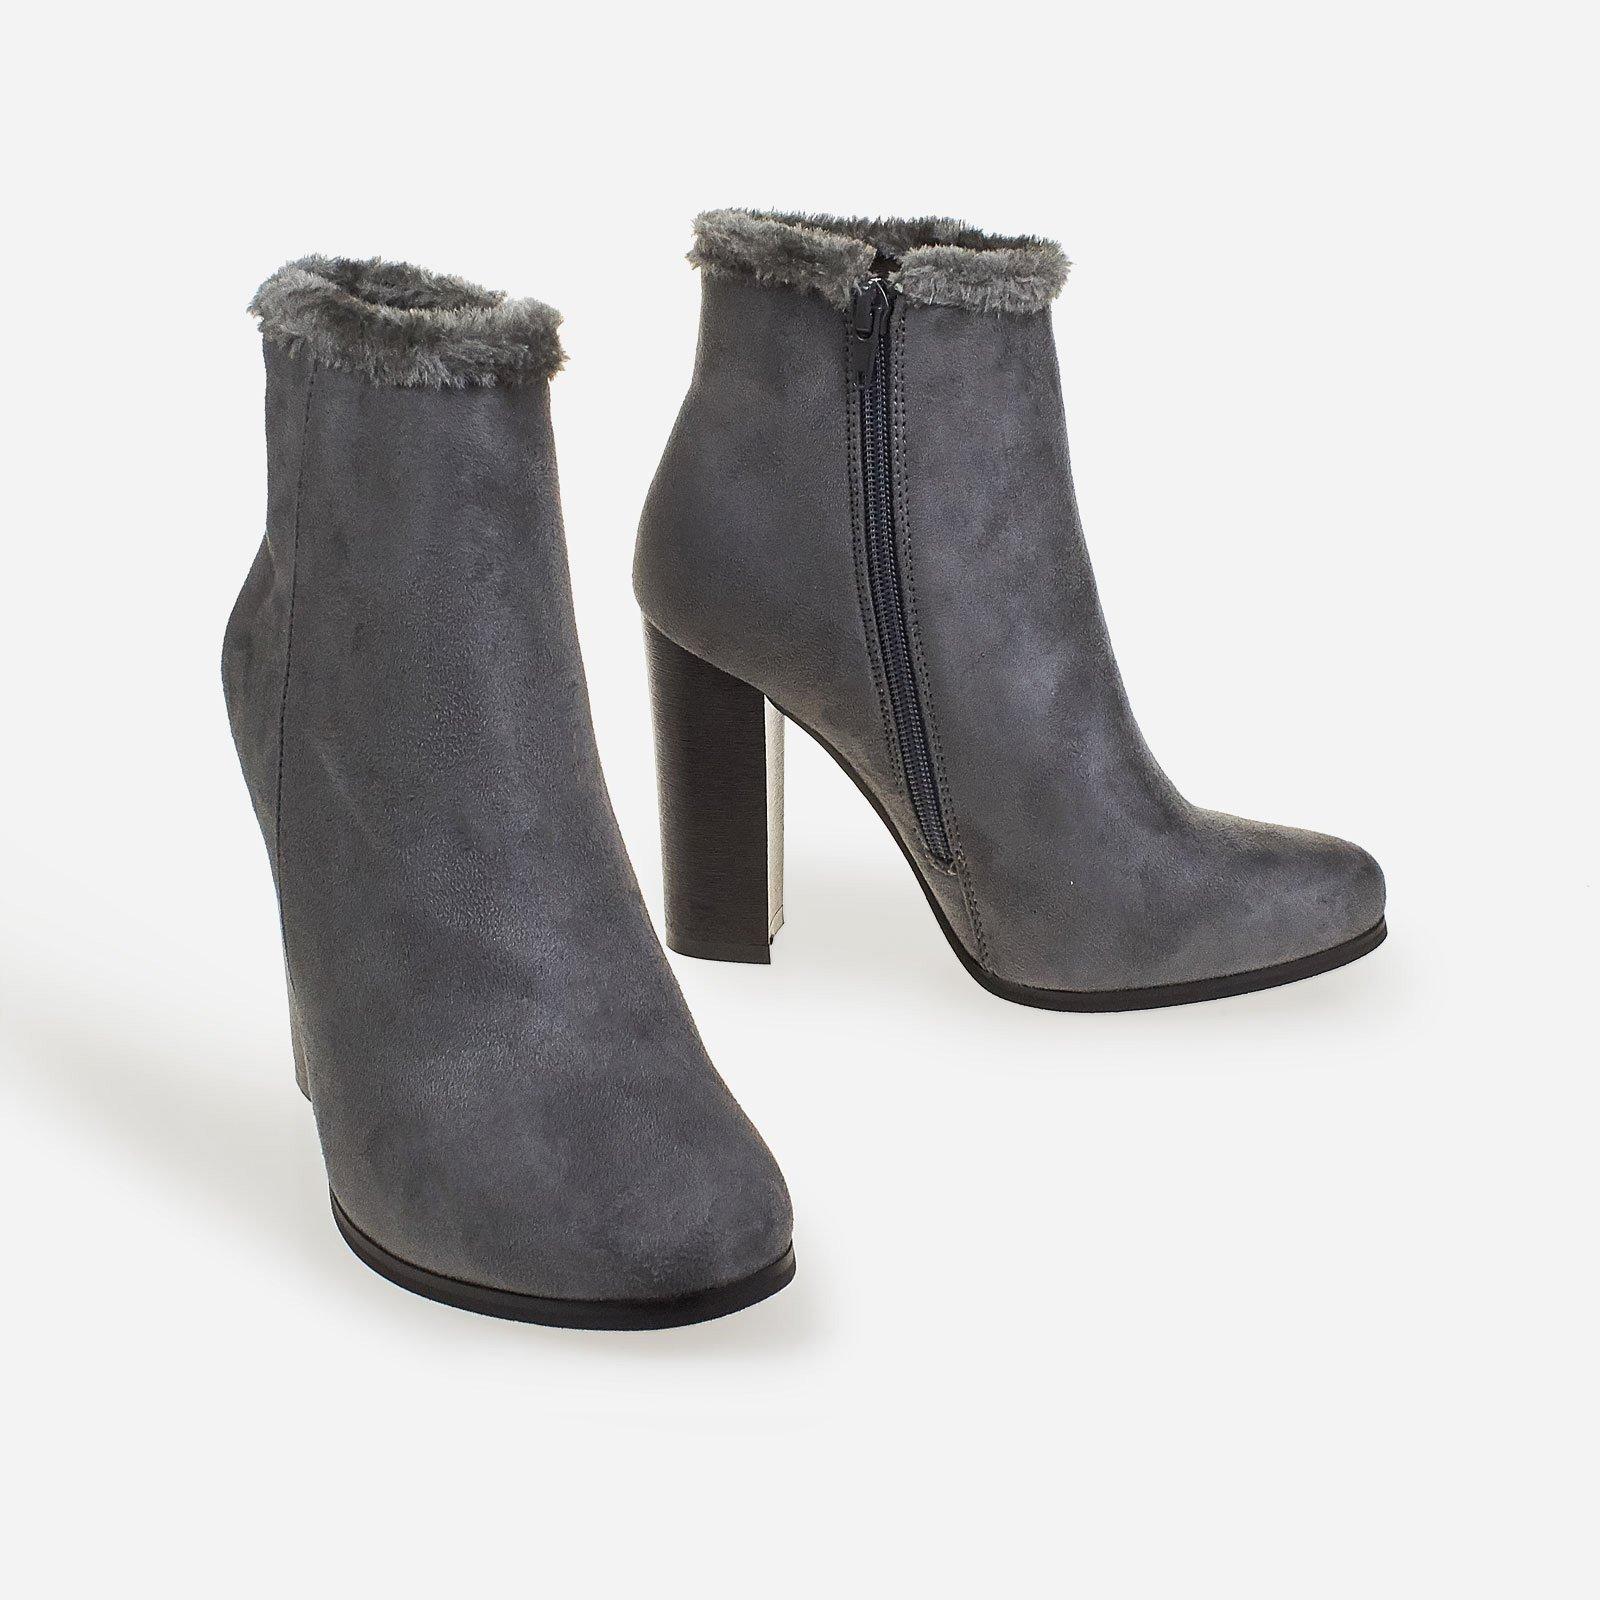 Adison Faux Fur Trim Block Heel Ankle Boot In Grey Faux Suede